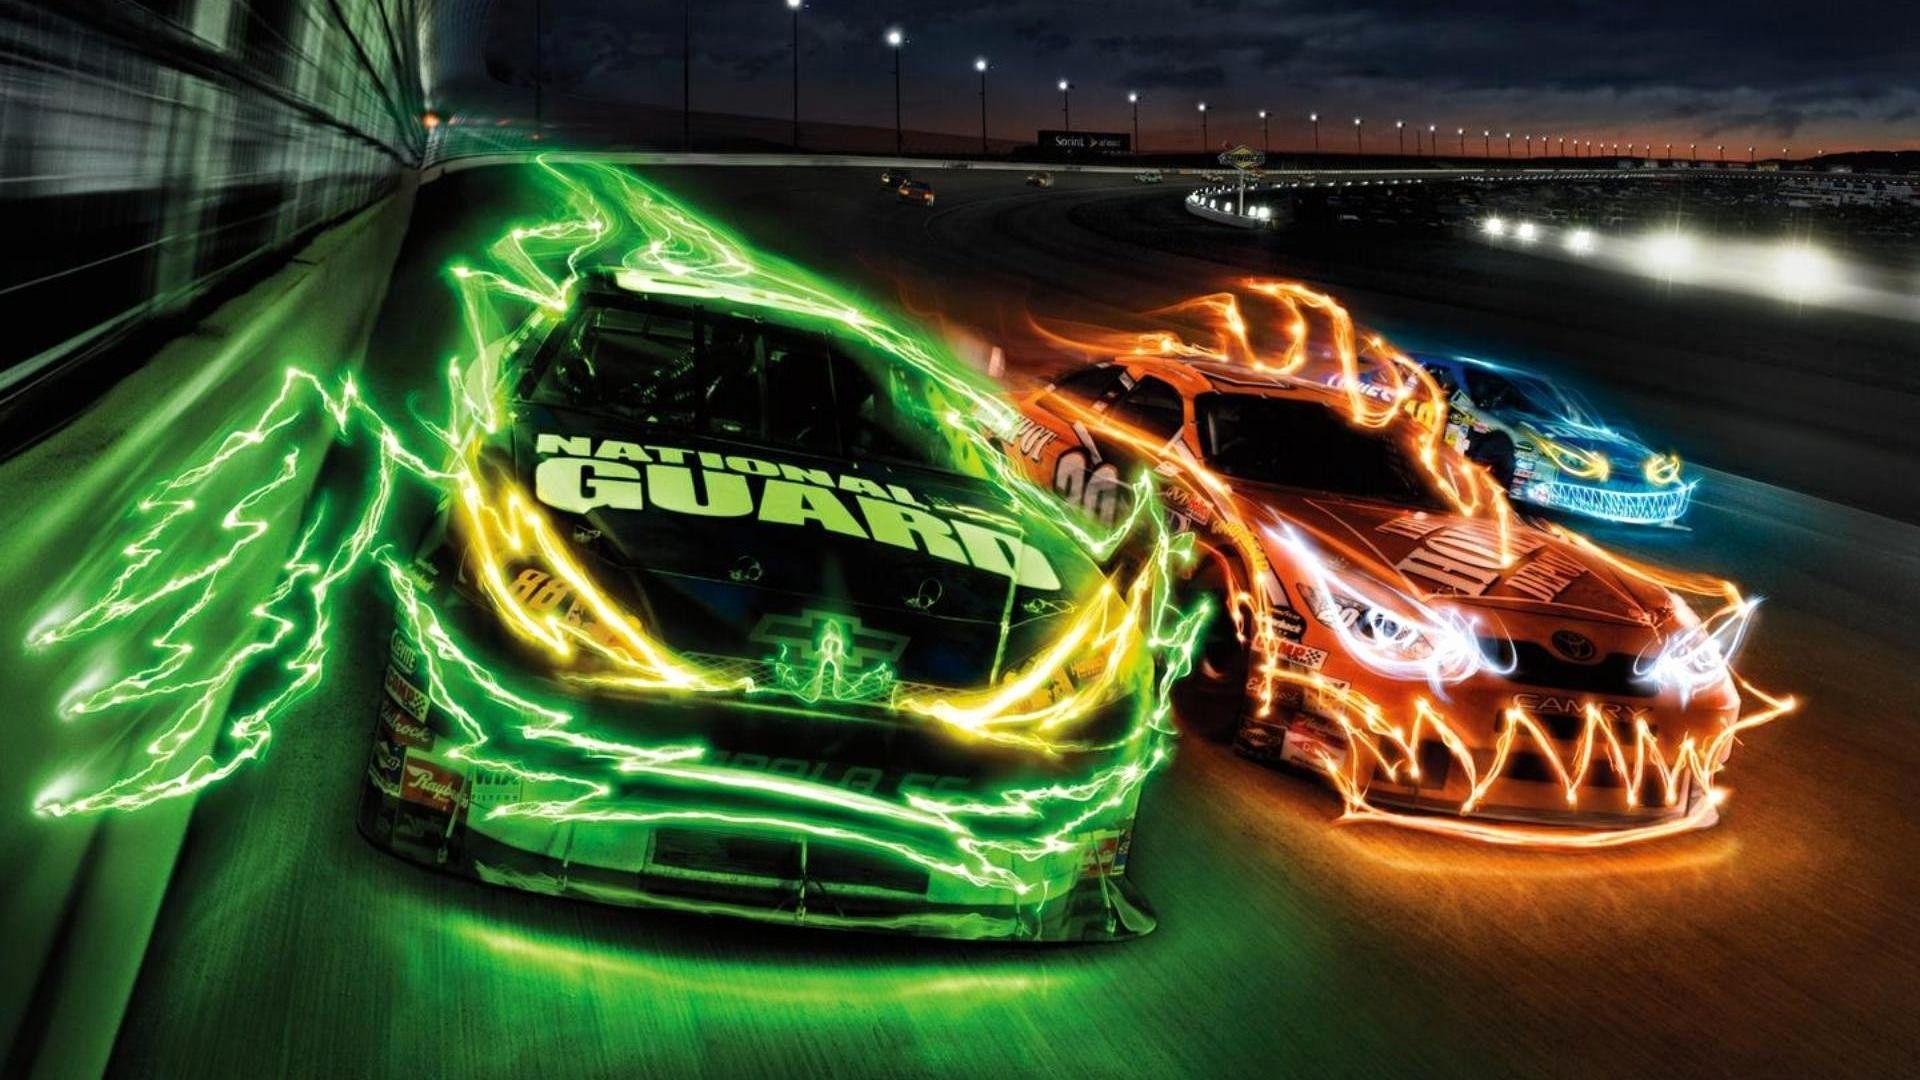 Cool Wallpaper Car Mywallpapers Site Neon Car Cars Music Nascar